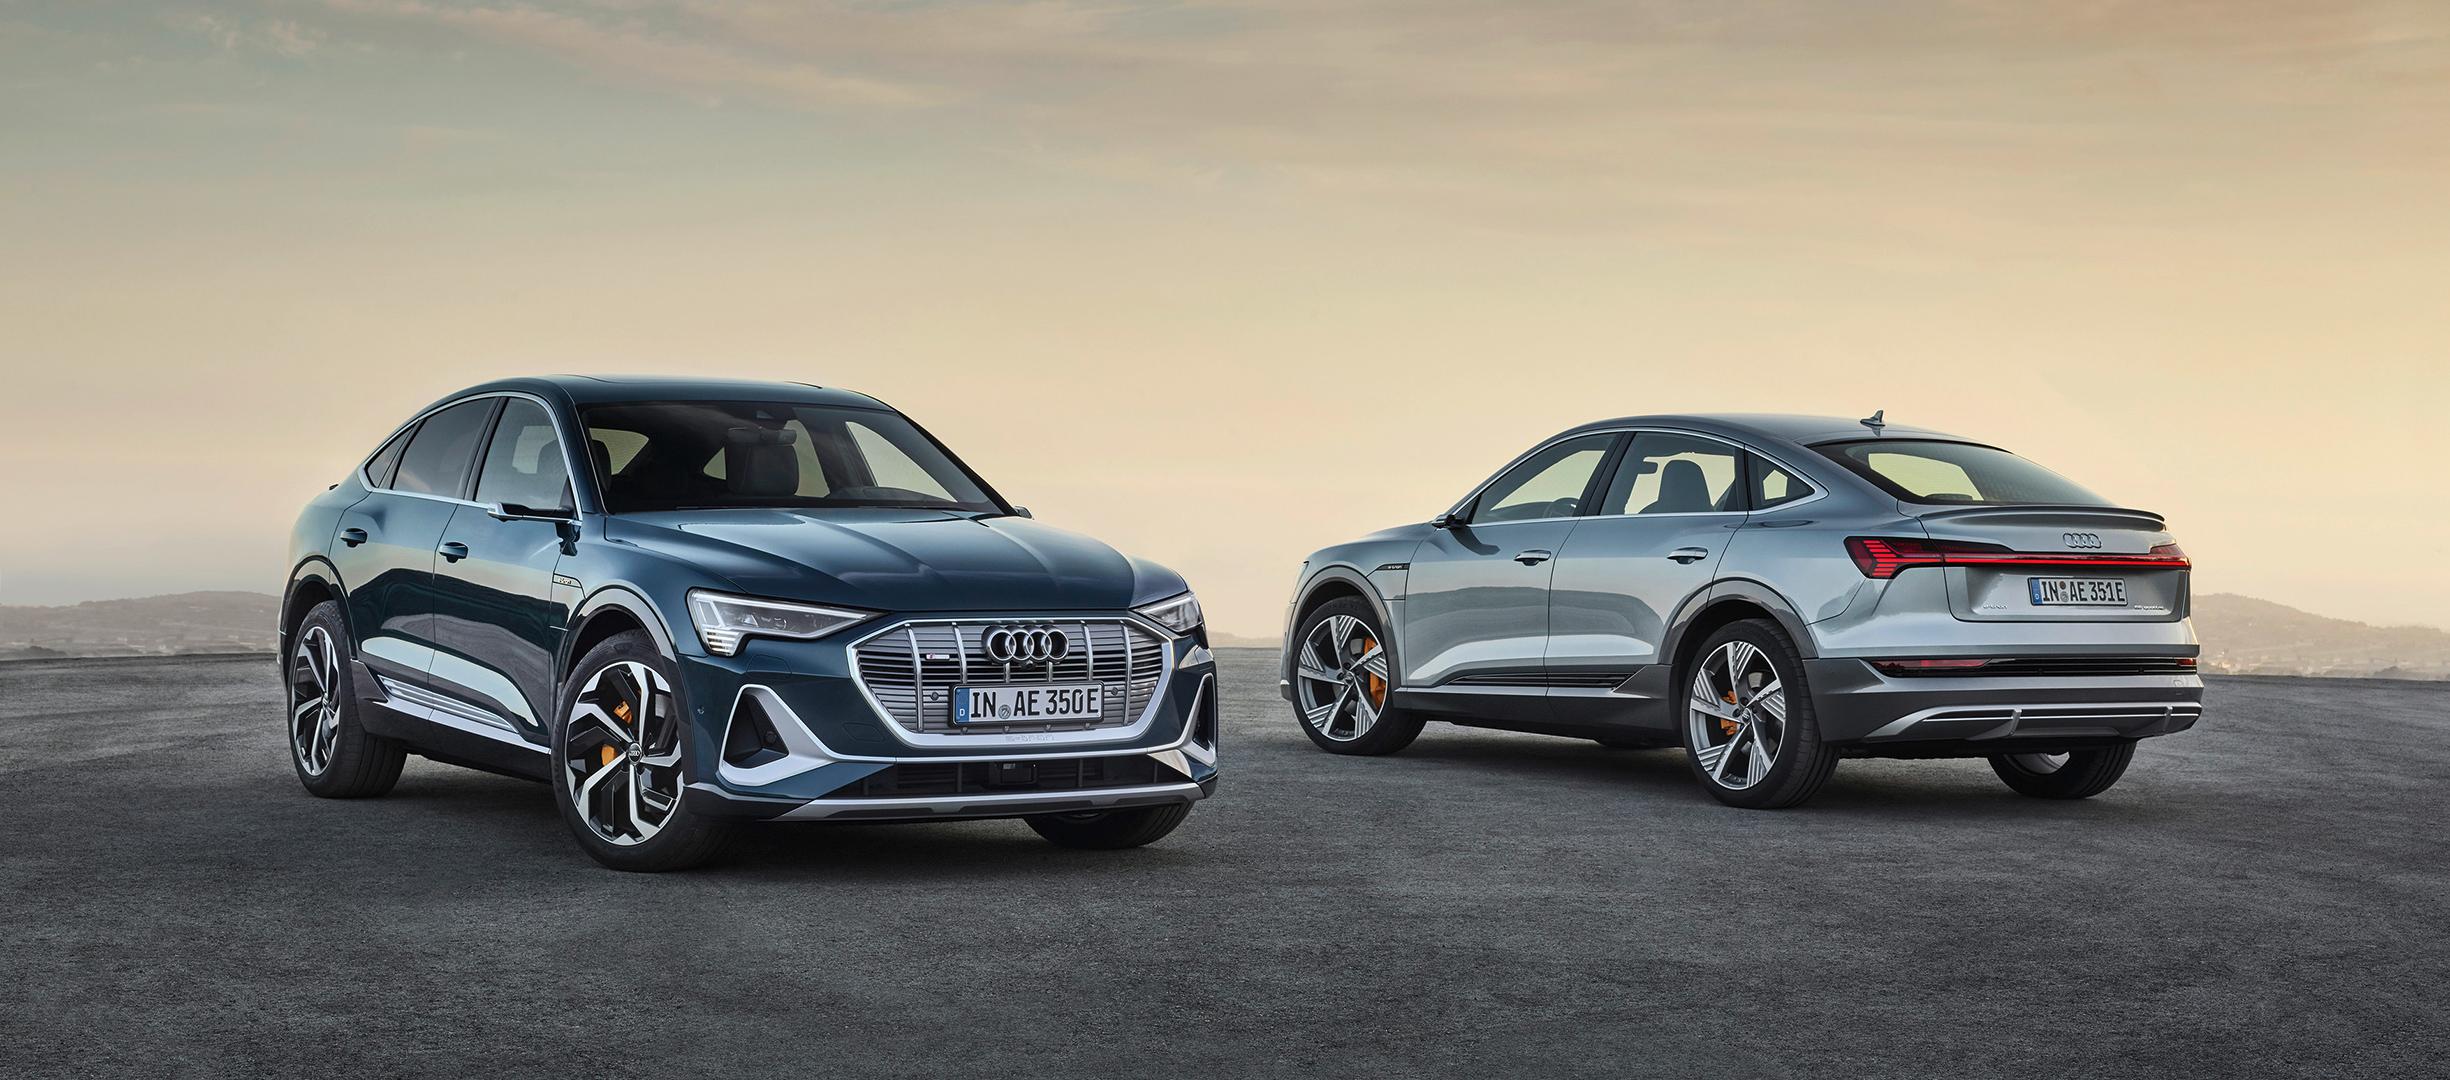 La gama e-Tron de Audi se completa con importantes novedades